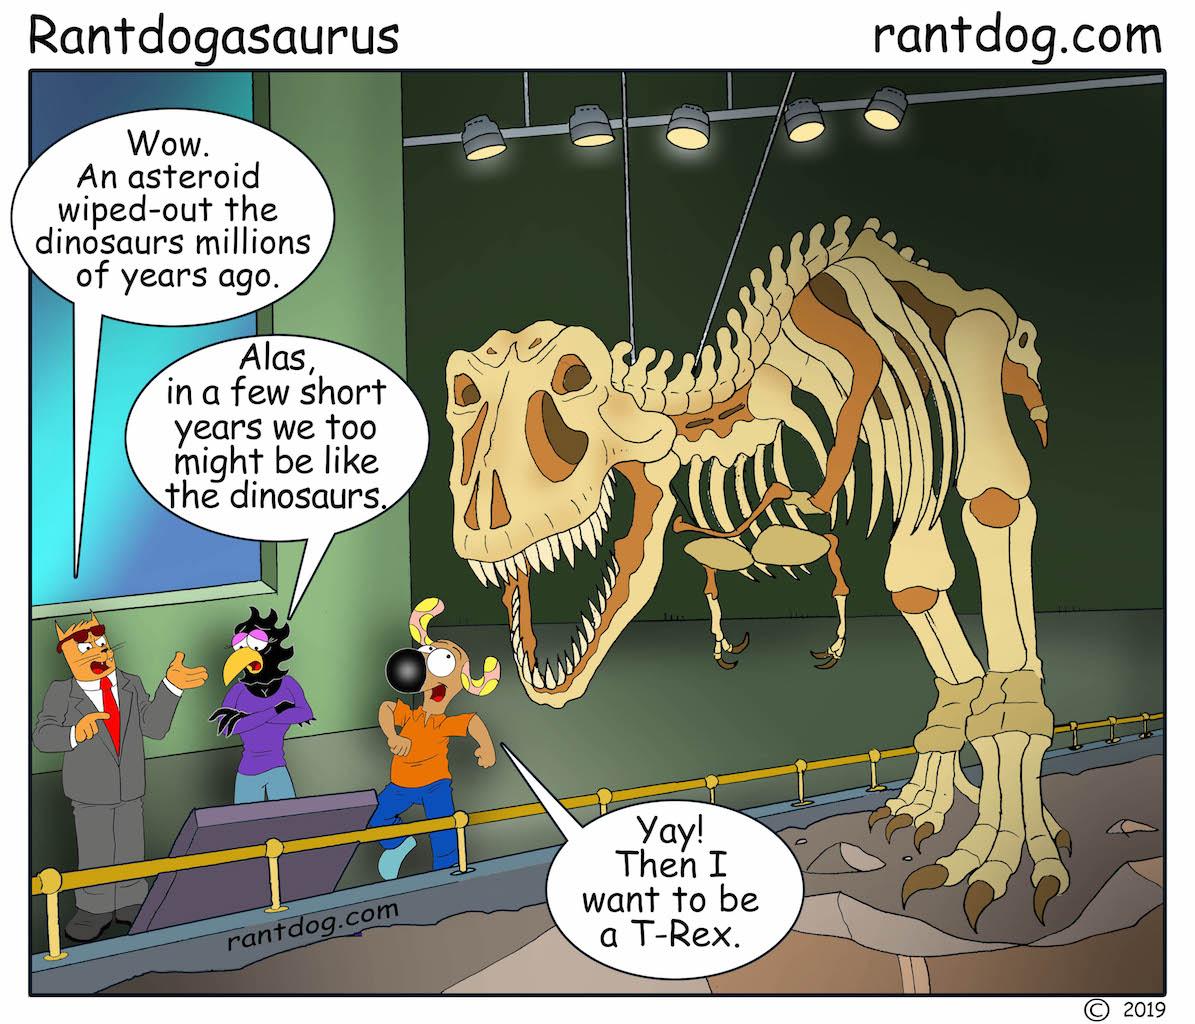 RDC_726_Rantdogasaurus.jpg